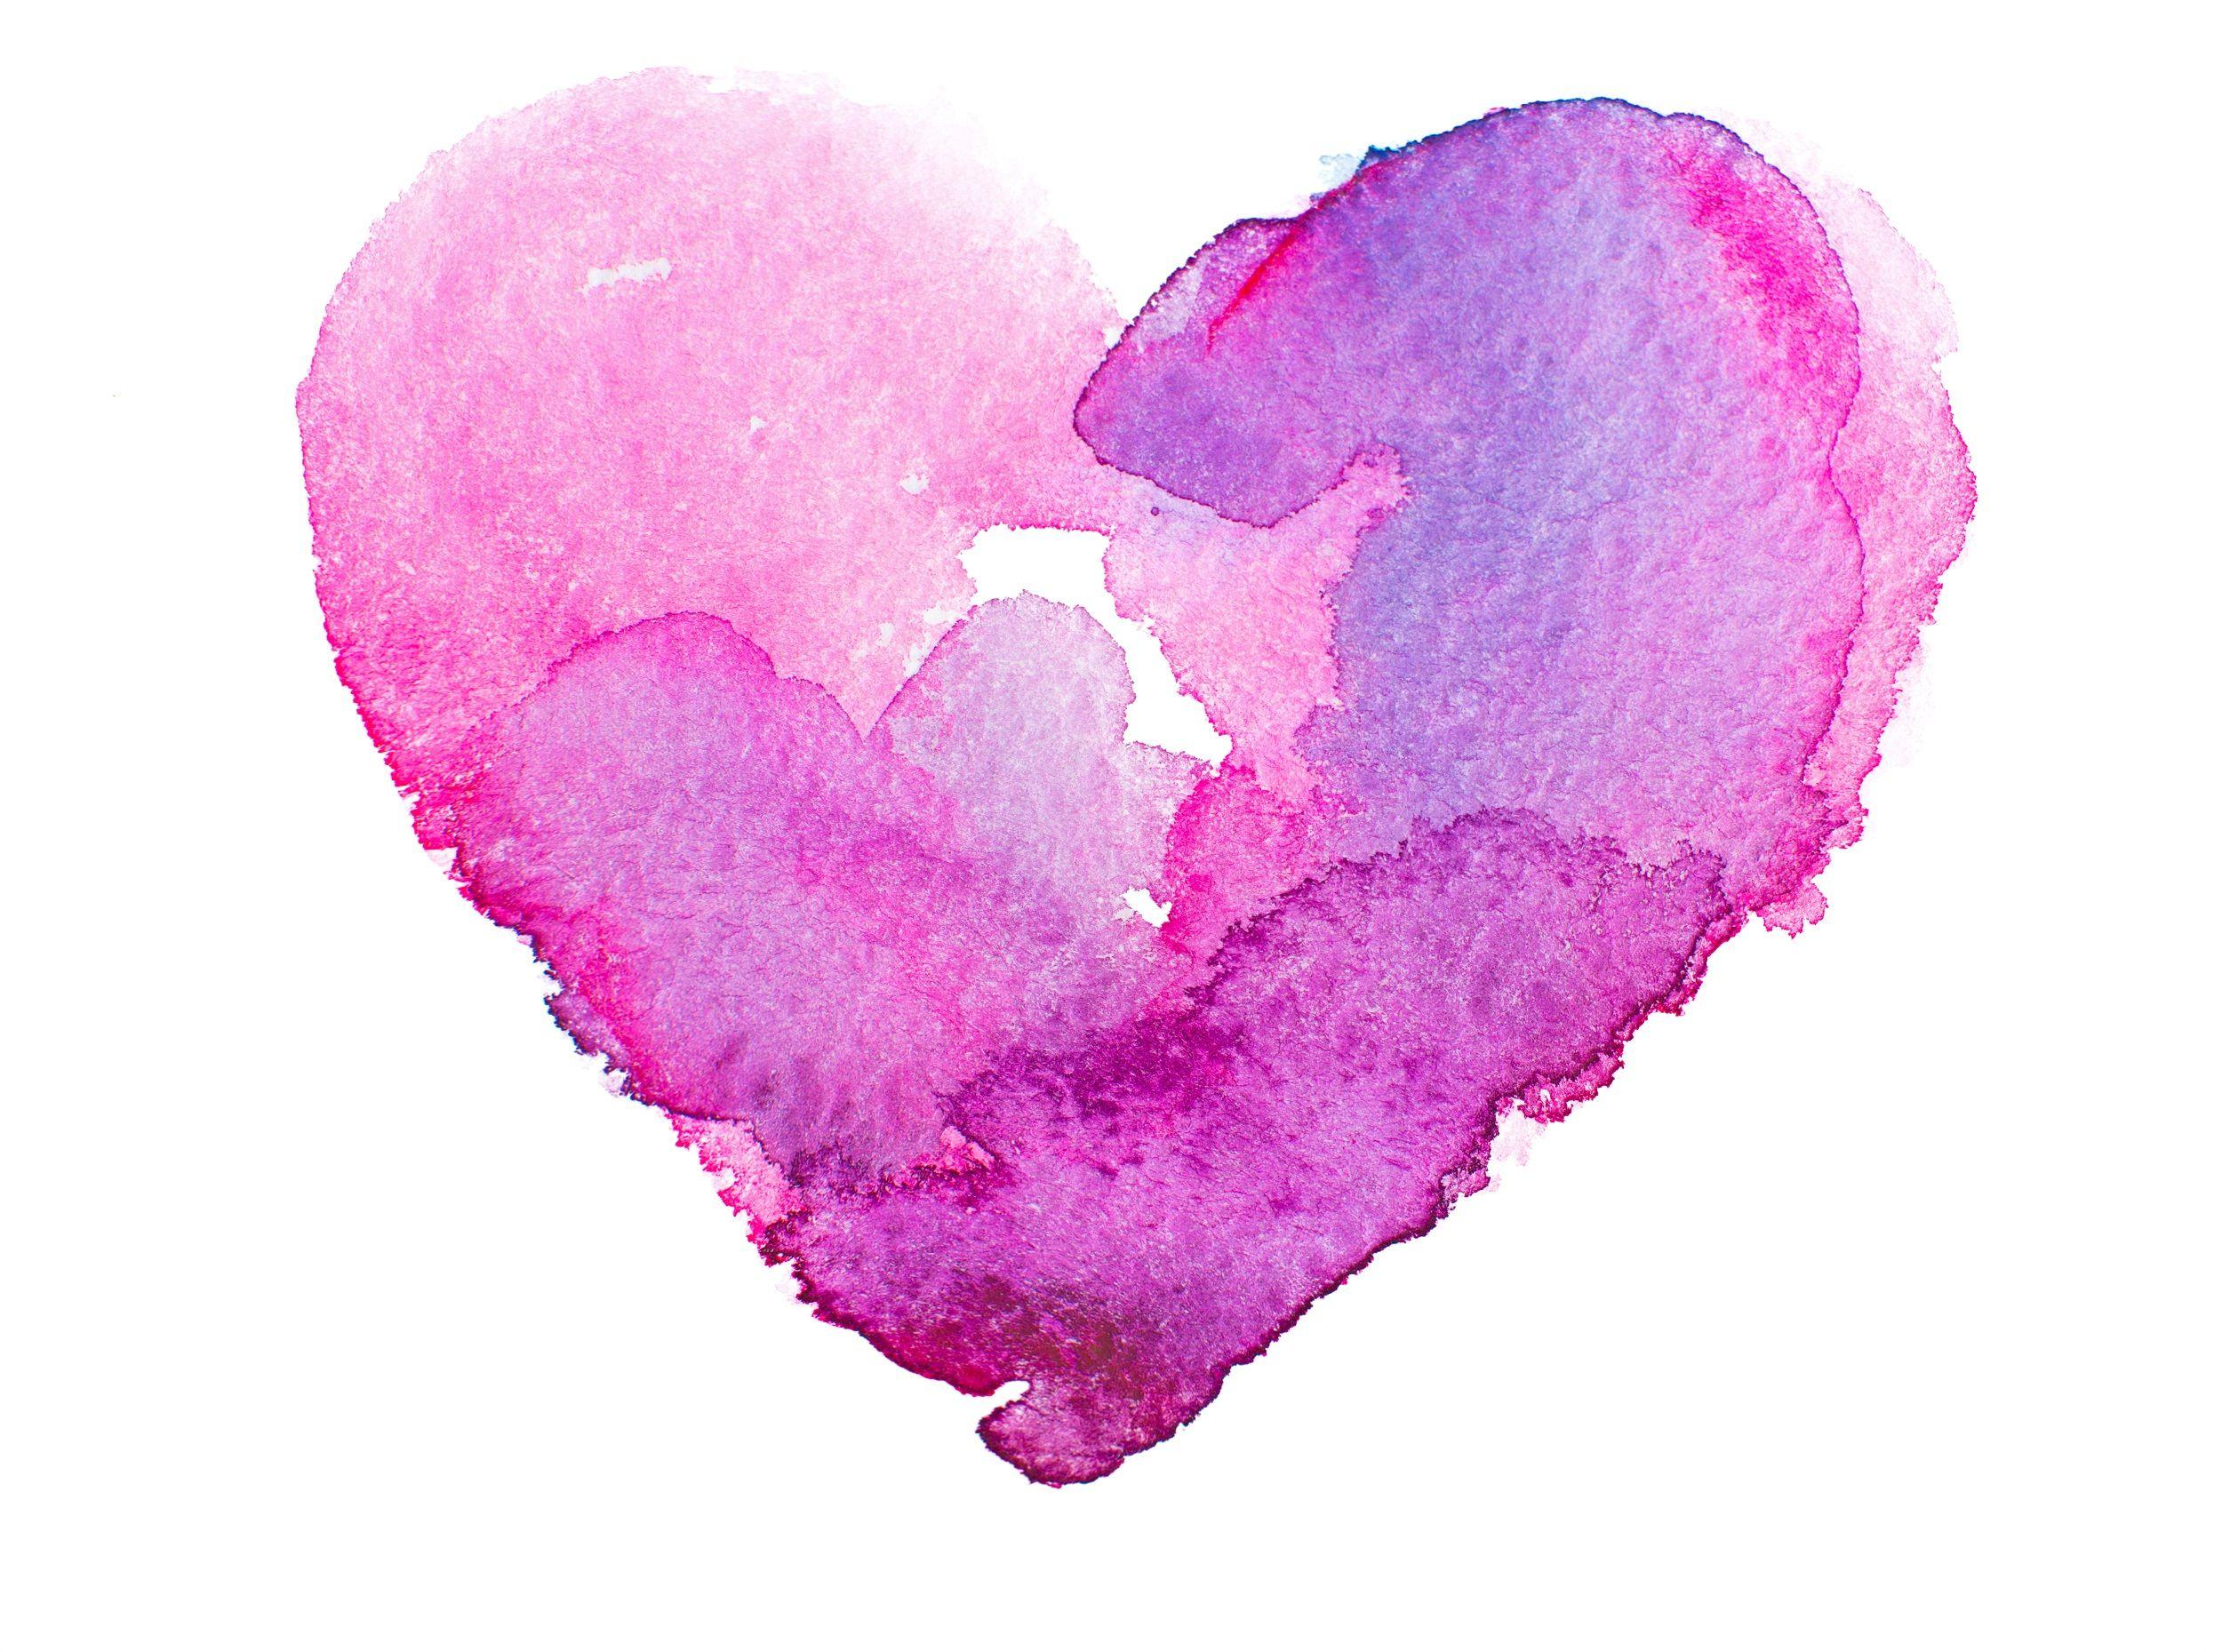 St. Jude Fullerton doula pink heart